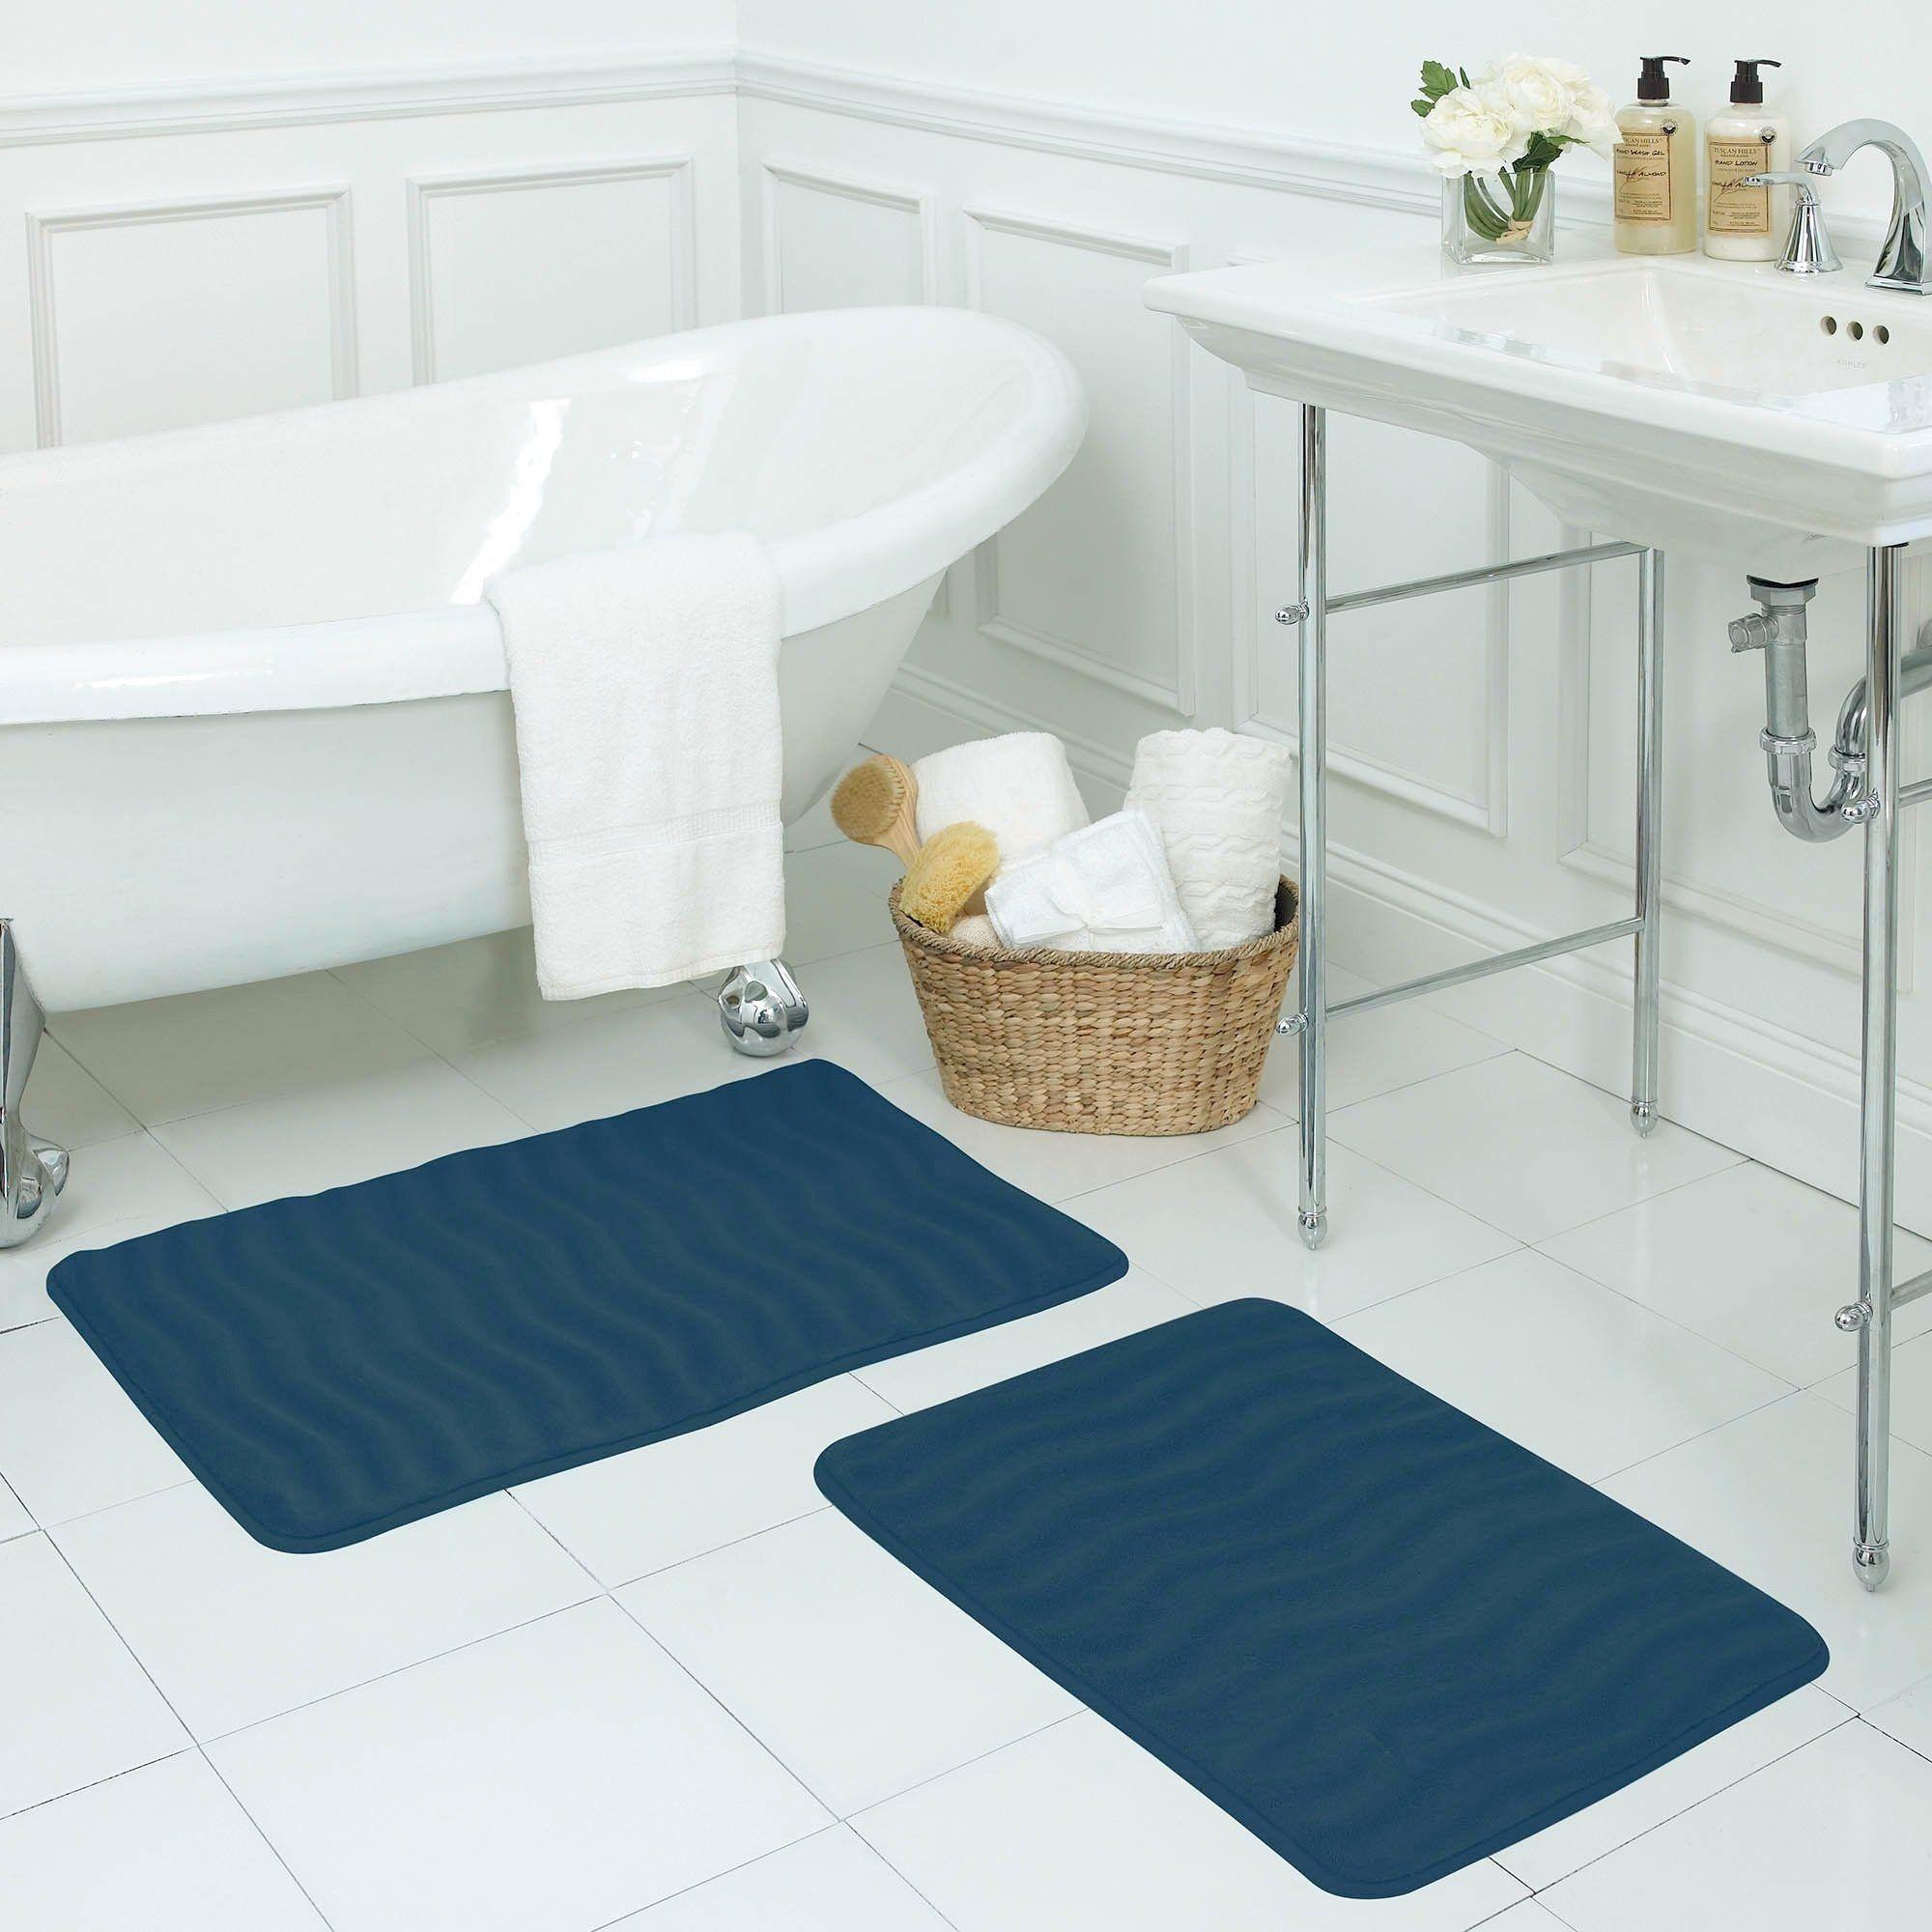 Waves Memory Foam 17 X 24 Inch 2 Piece Bath Mat Set With